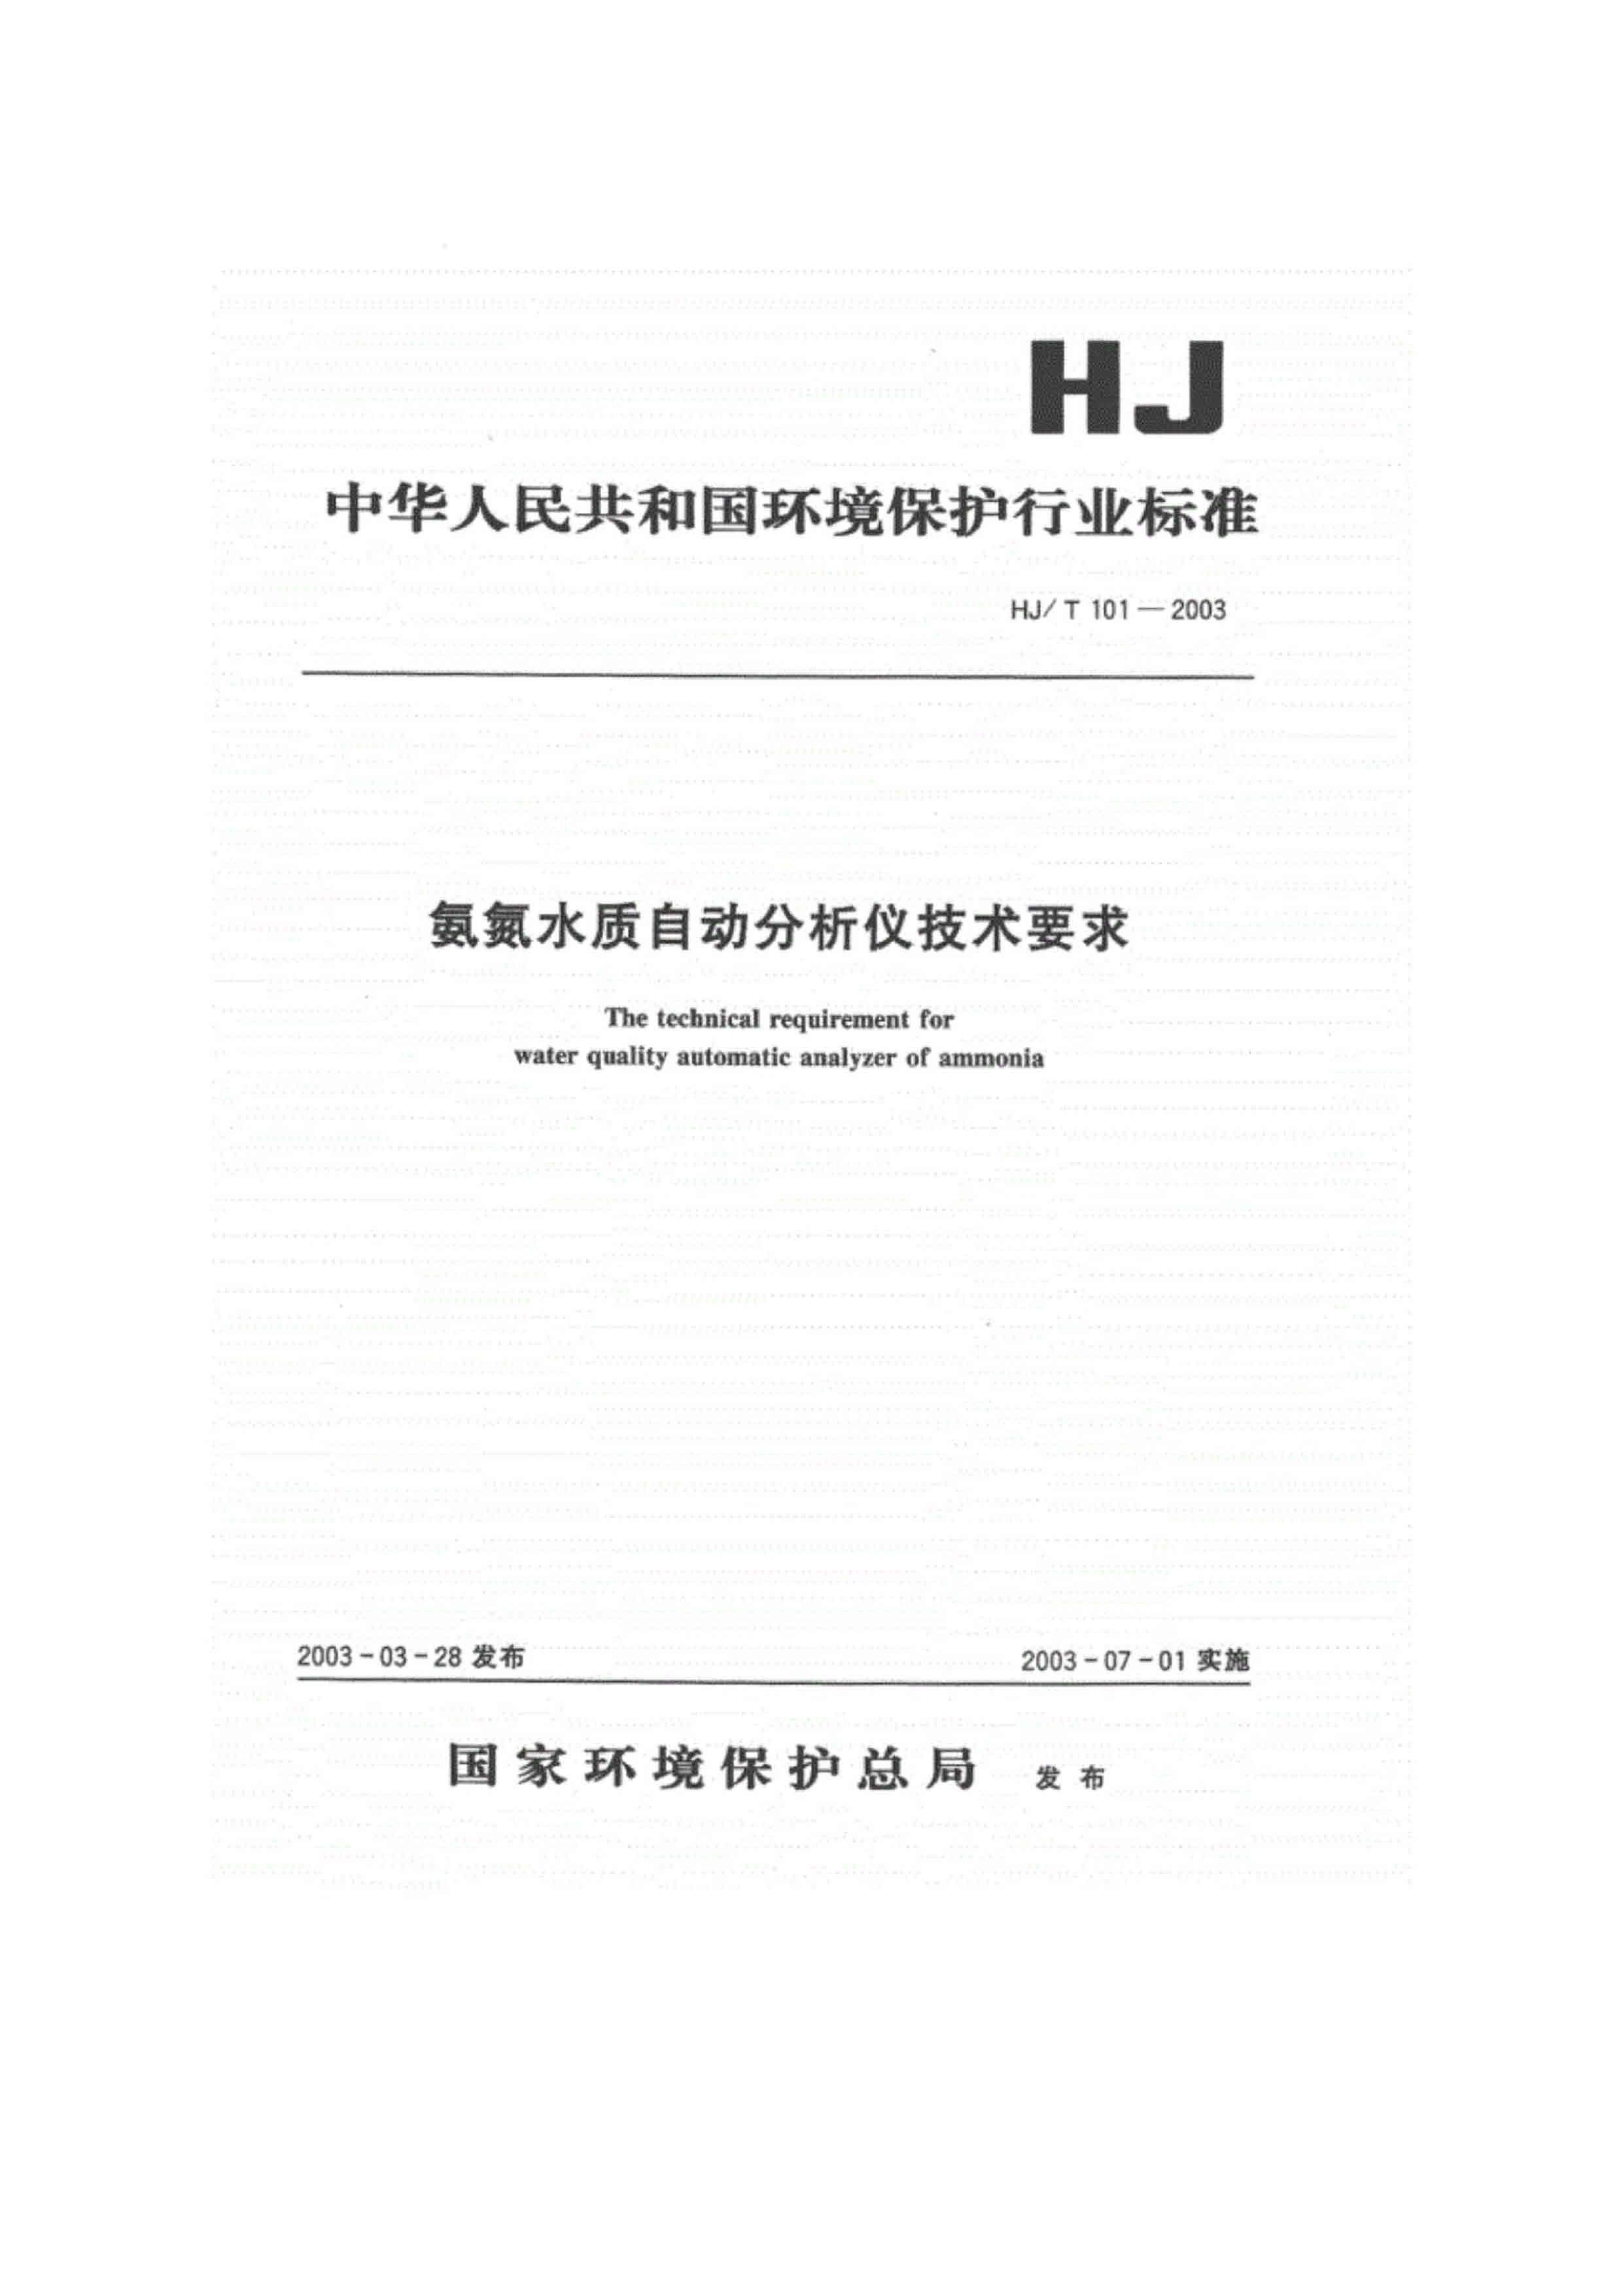 HJ-T101-2003 环境保护产品技术要求 氨氮水质自动分析仪技术要求 下载